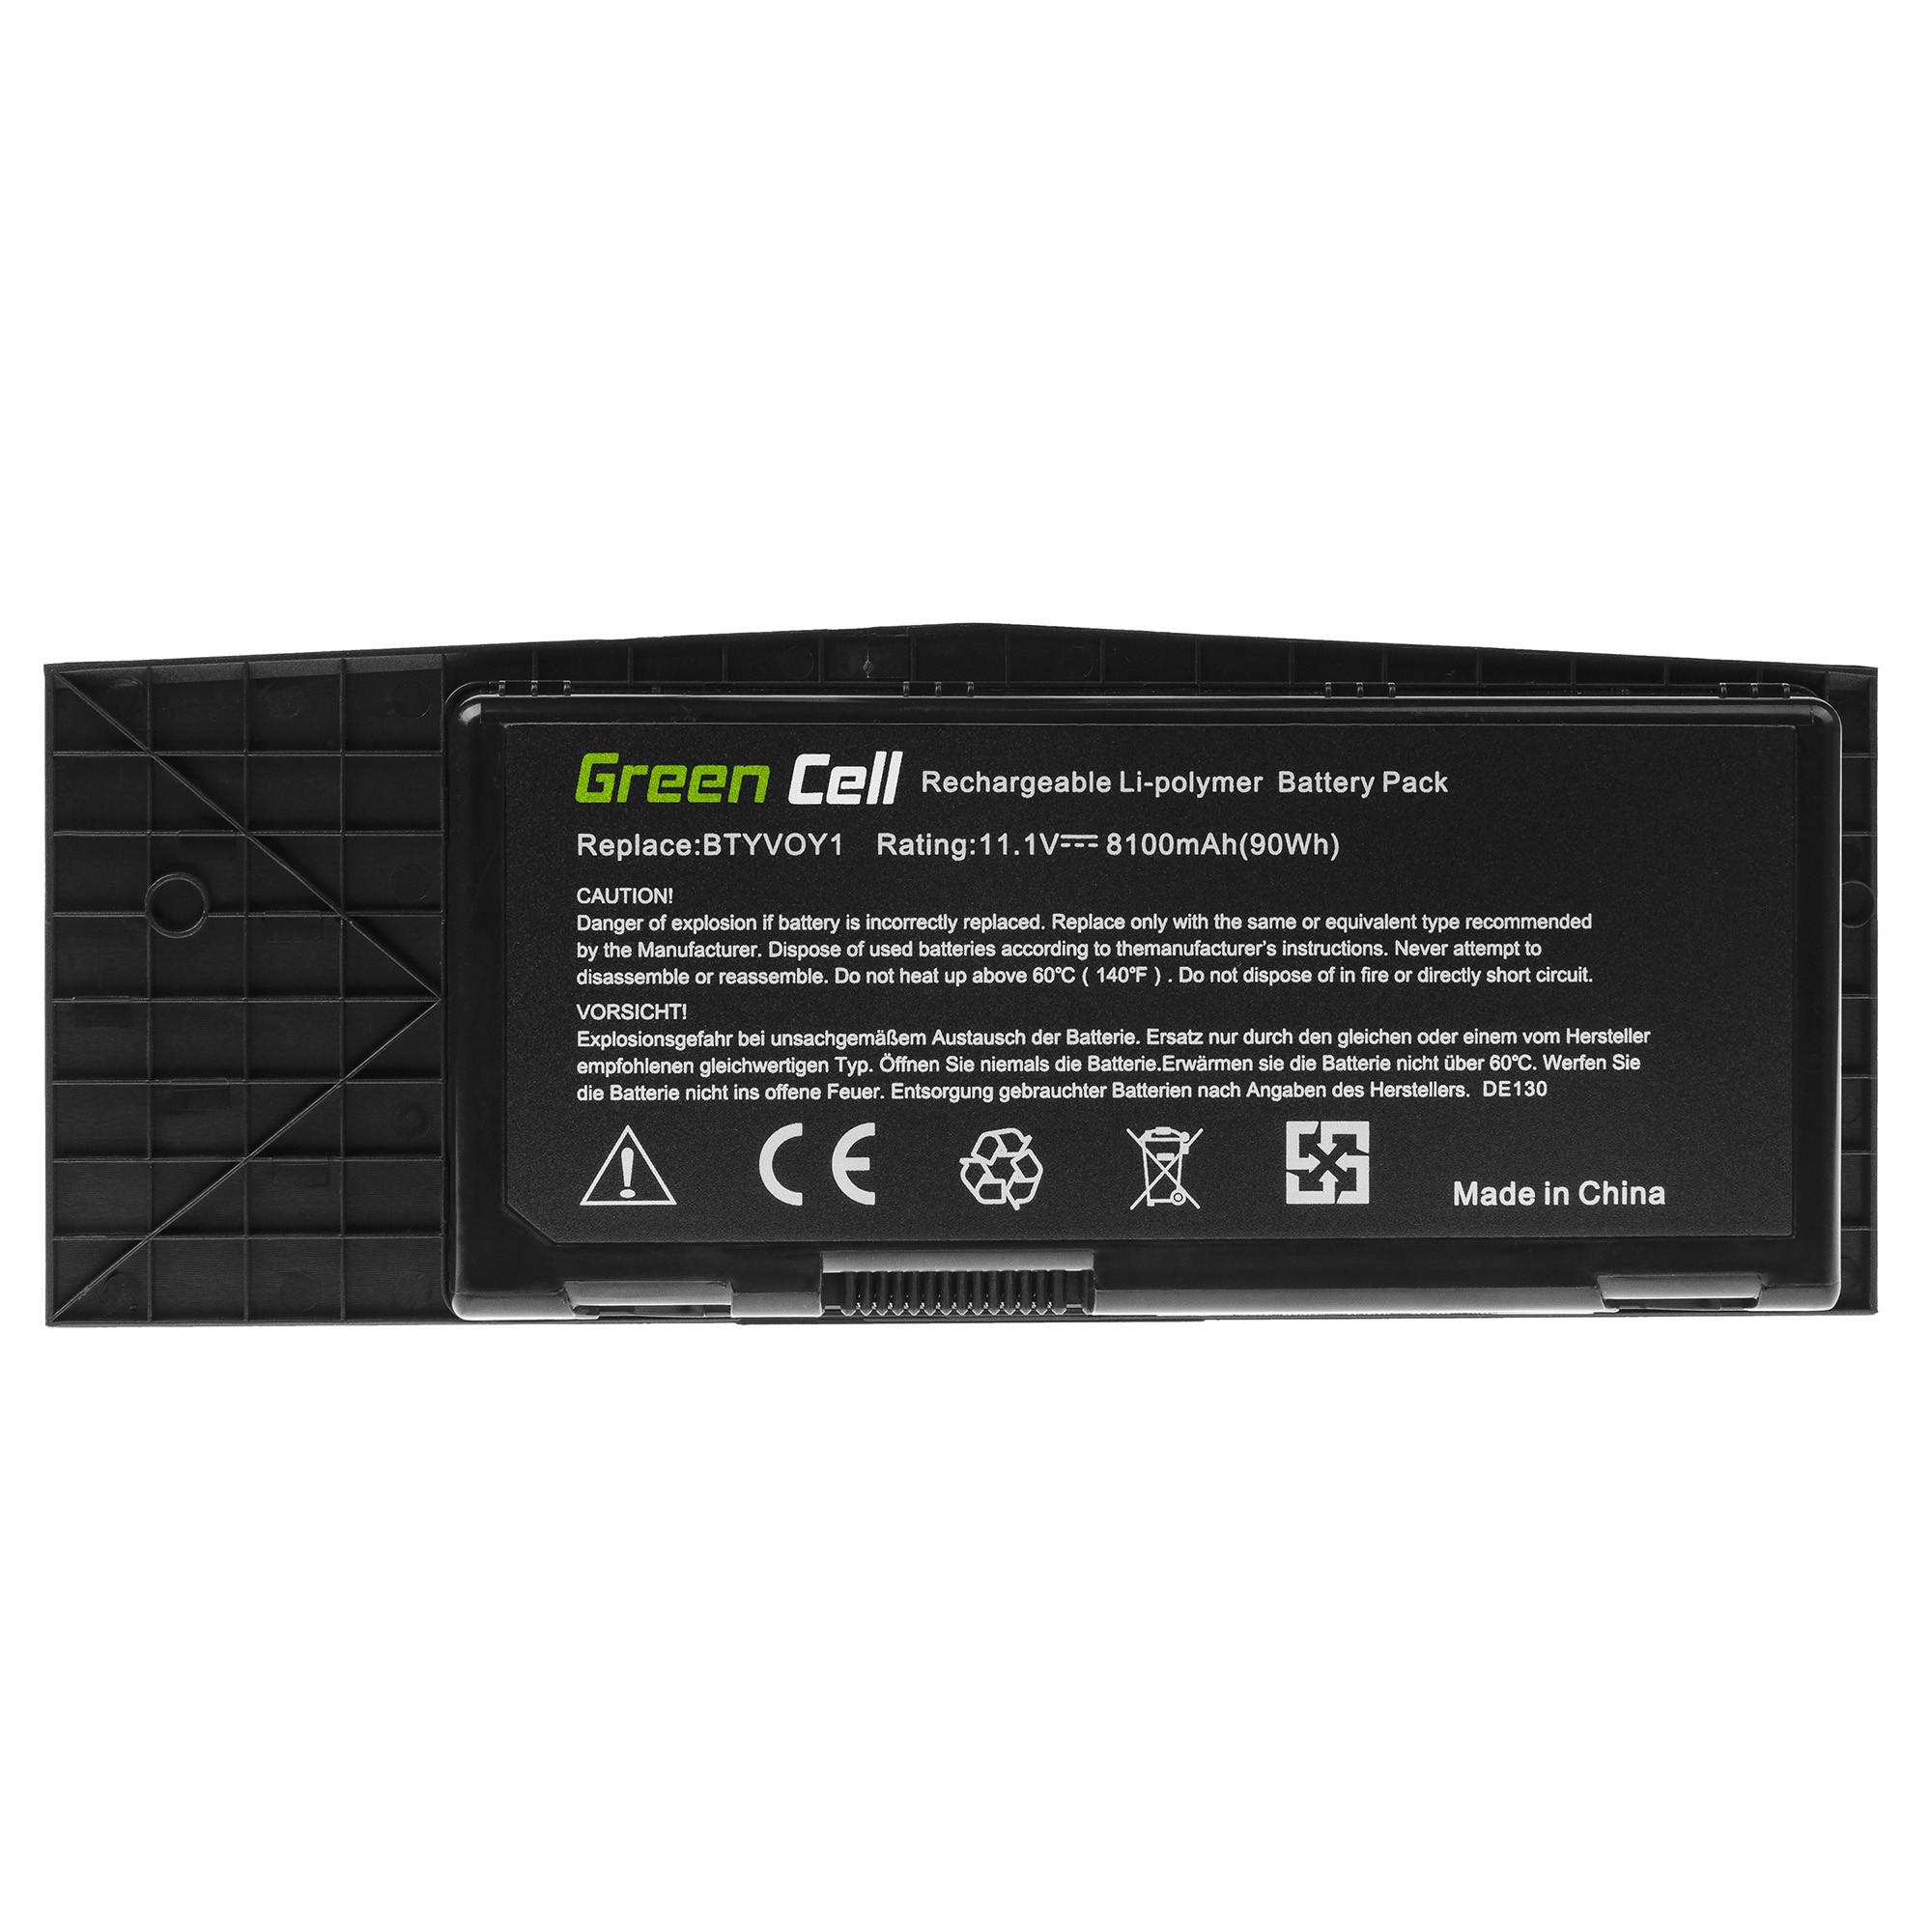 Green Cell DE130 Baterie Dell BTYVOY1,05WP5W ,07XC9N, 0C0C5M, 5WP5W, 7XC9N, Dell Alienware M17x R3 M17x R4 8100mAh Li-Pol – neoriginální